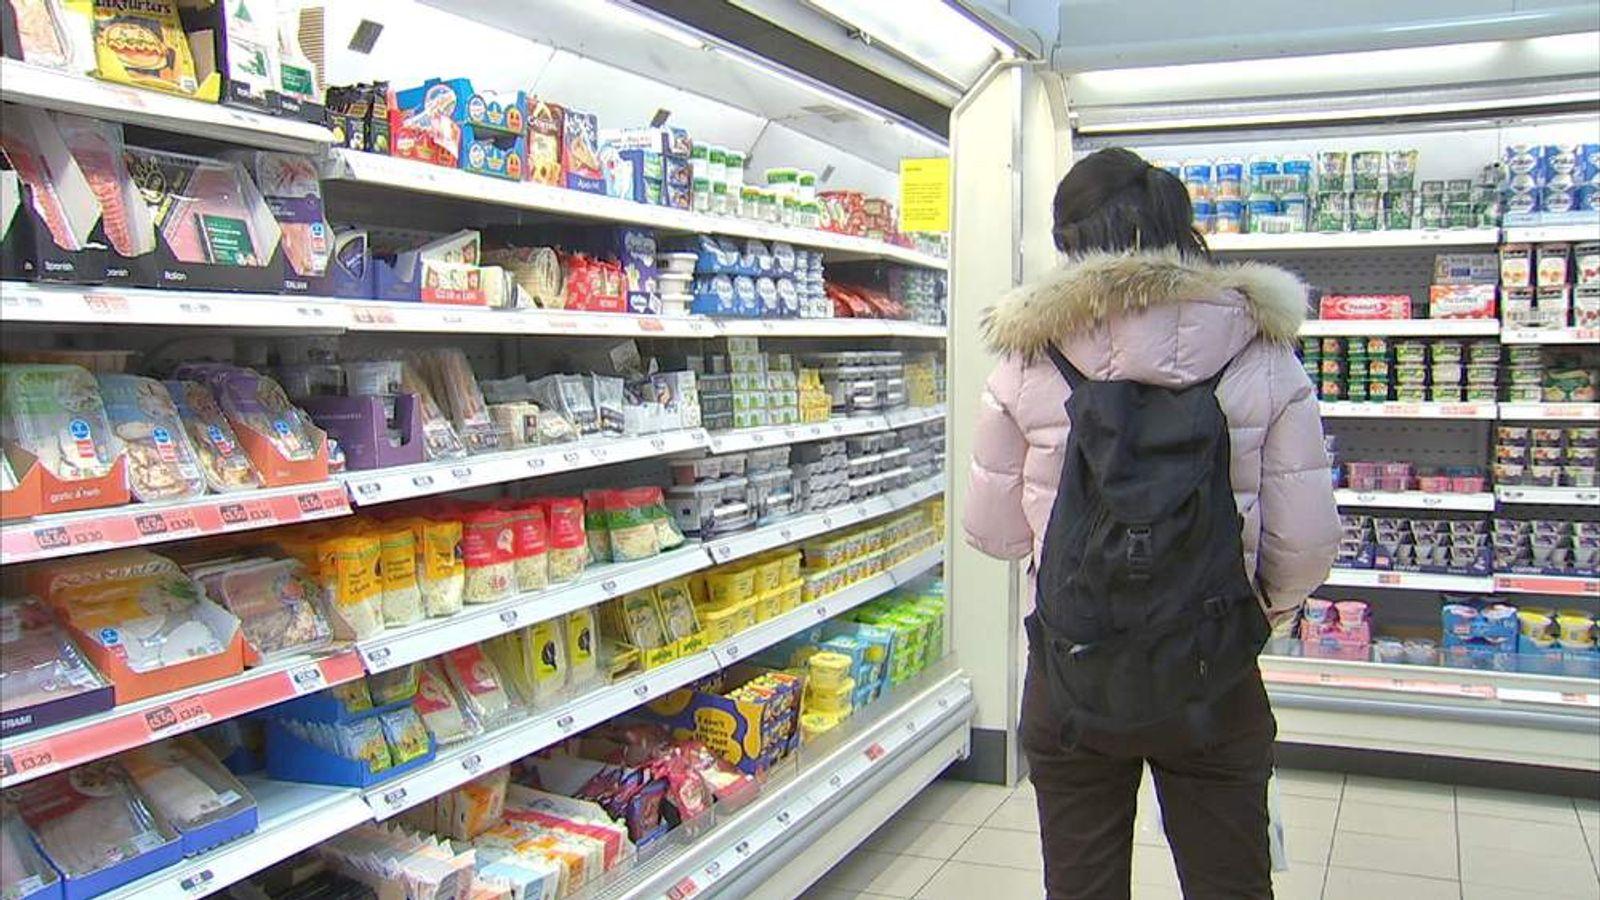 Sainsbury's food on shelves